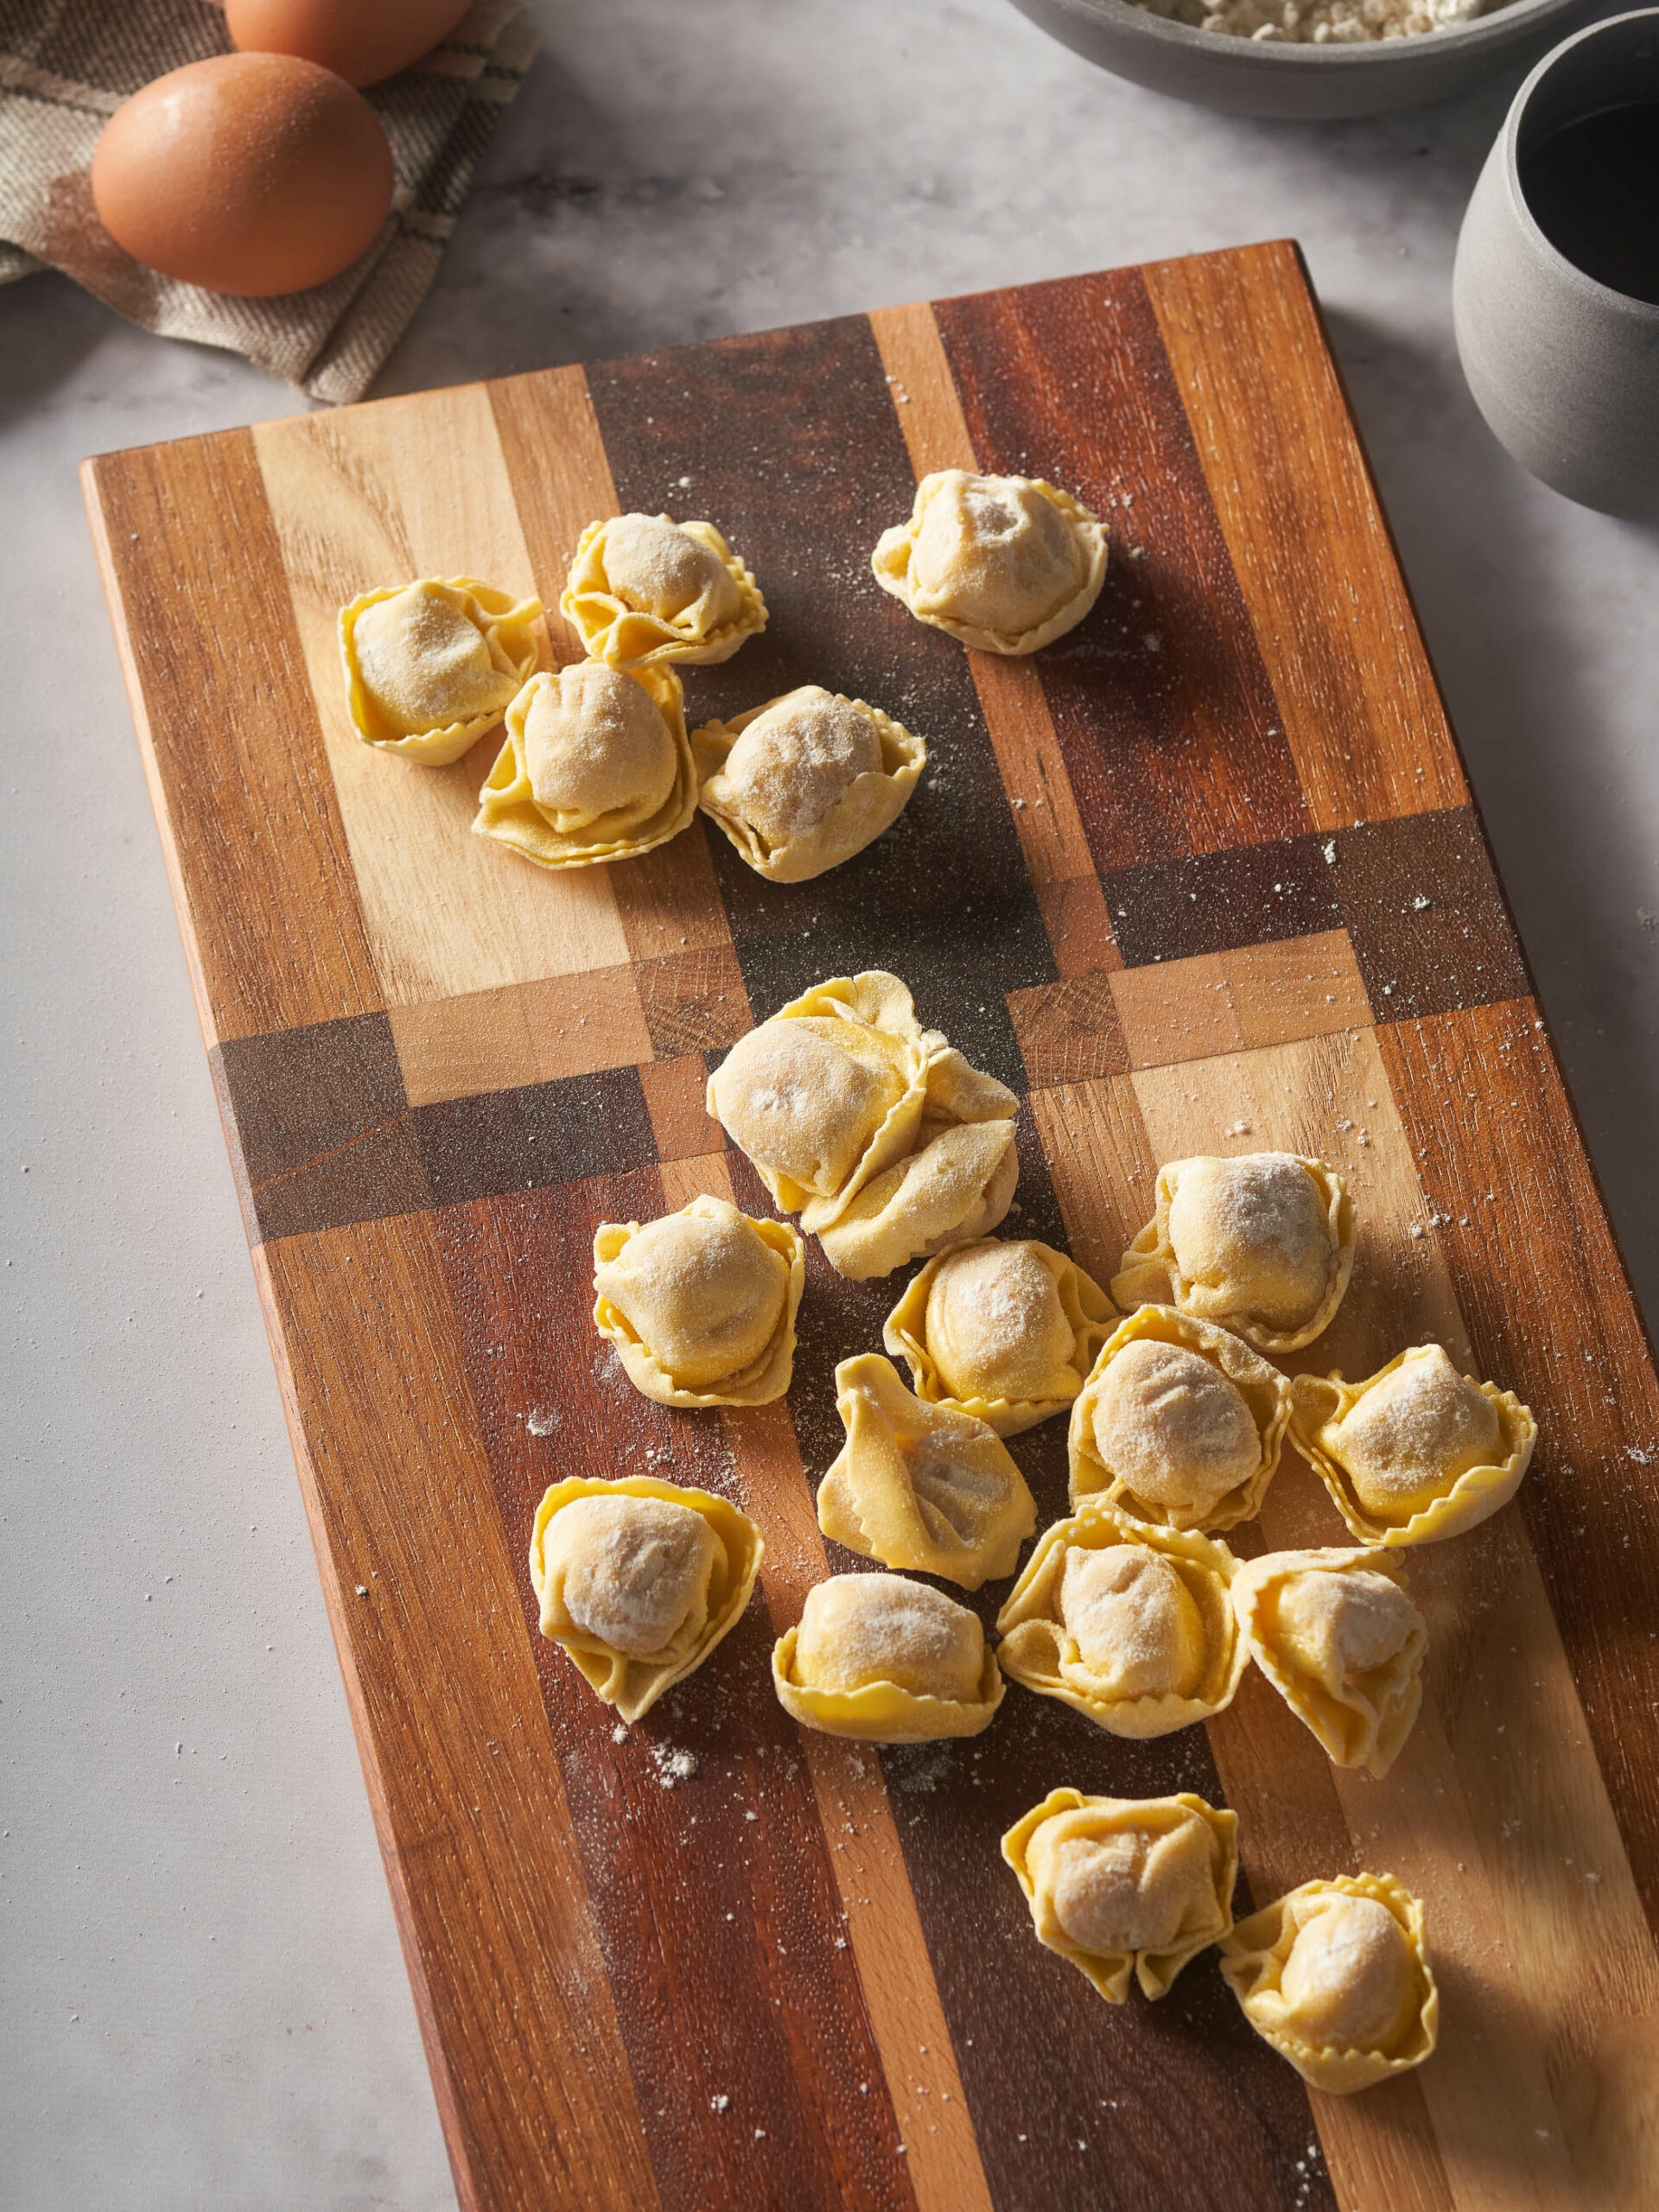 Home economist & food stylist Madrid pasta fresca